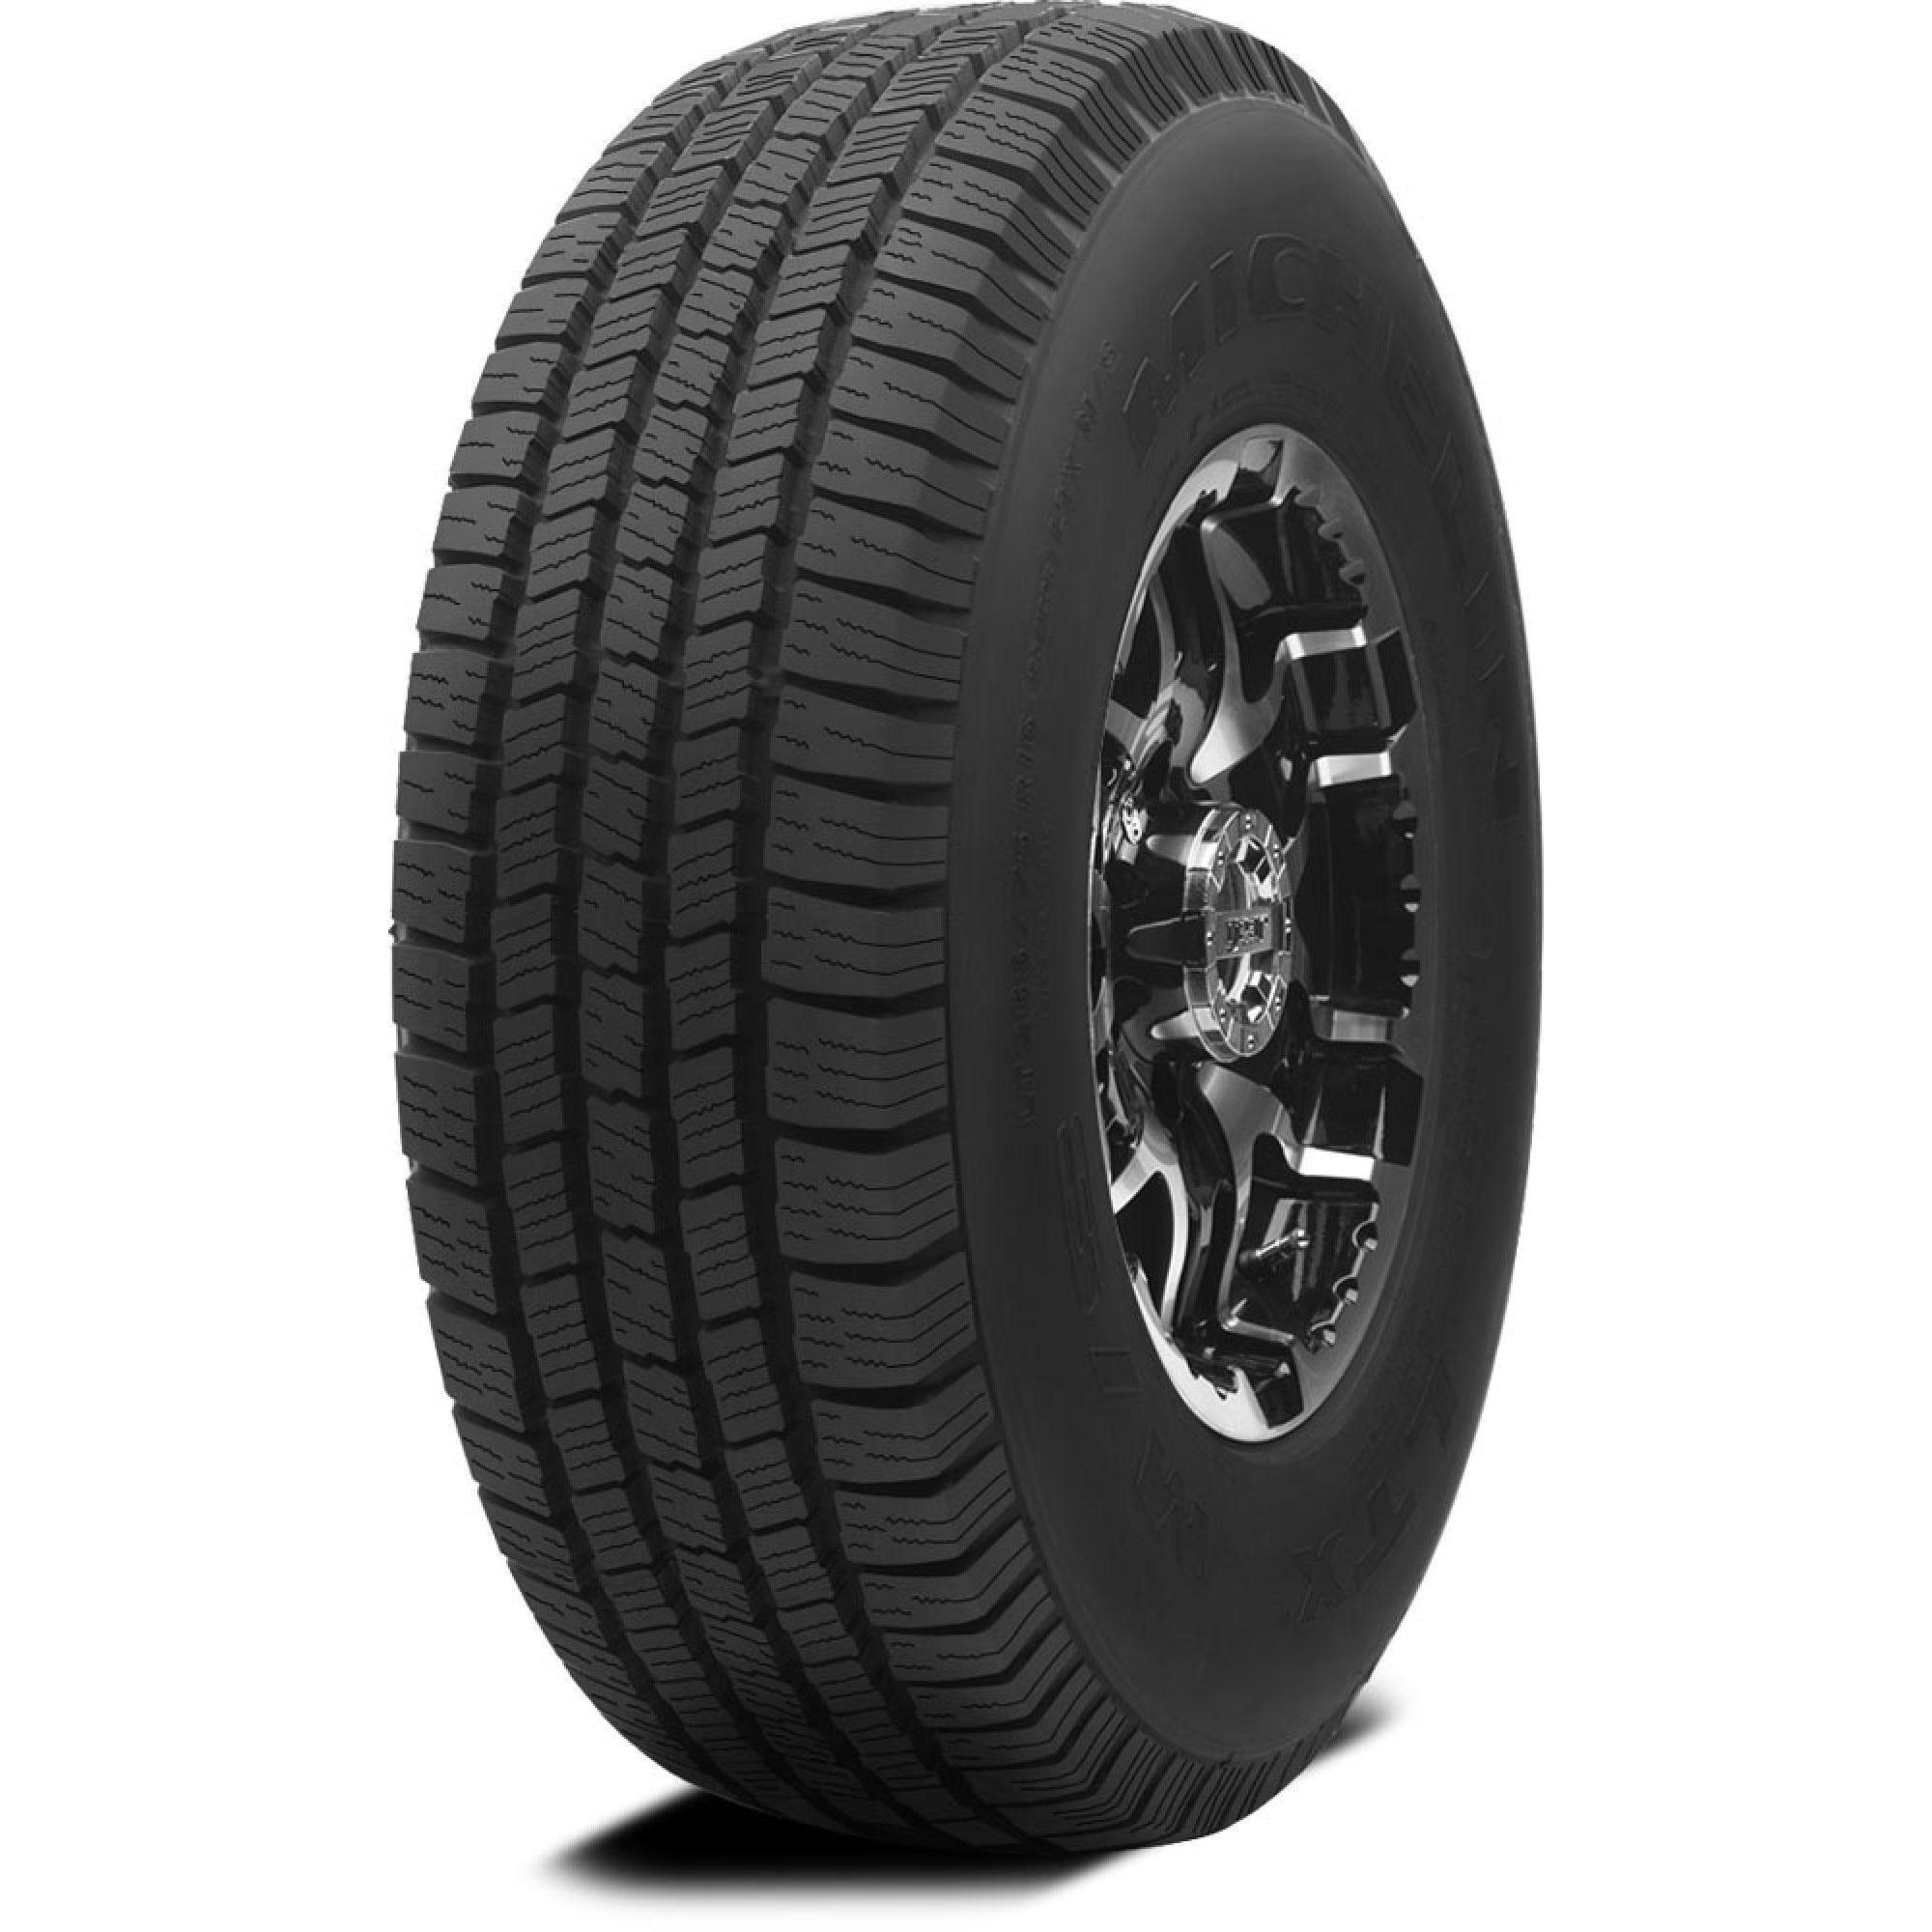 coupon used garage racks tire tirerackwholesale home for hangers trucks storage login rack stands sale